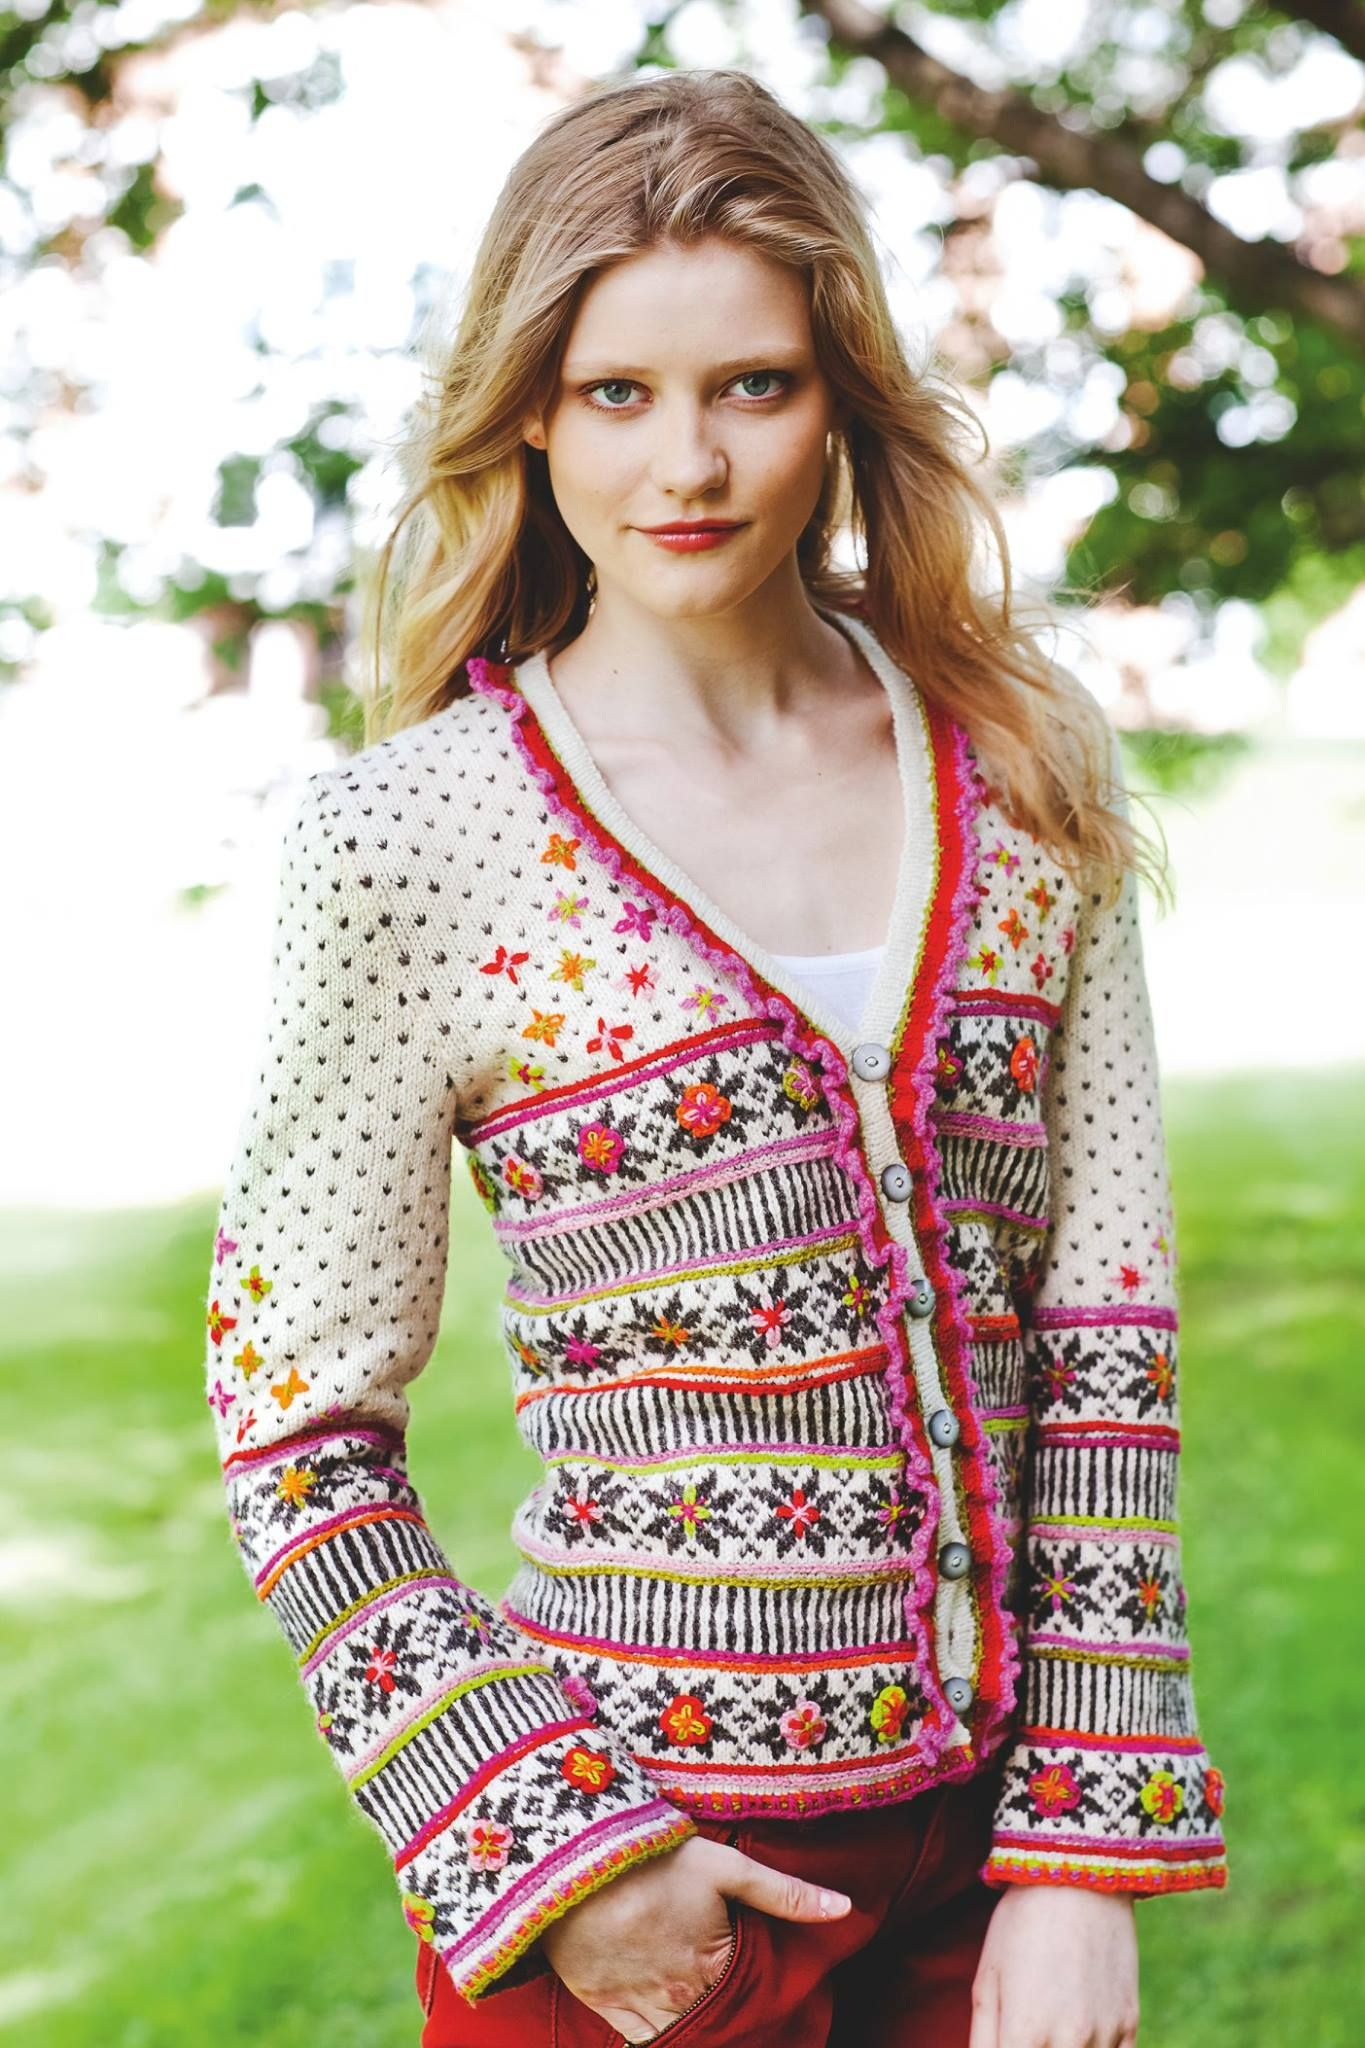 Dagens gratisoppskrift jakke med ttebladsroser ravelry rauma jakke med ttebladsroser og broderier pattern by sidsel j bankloansurffo Gallery